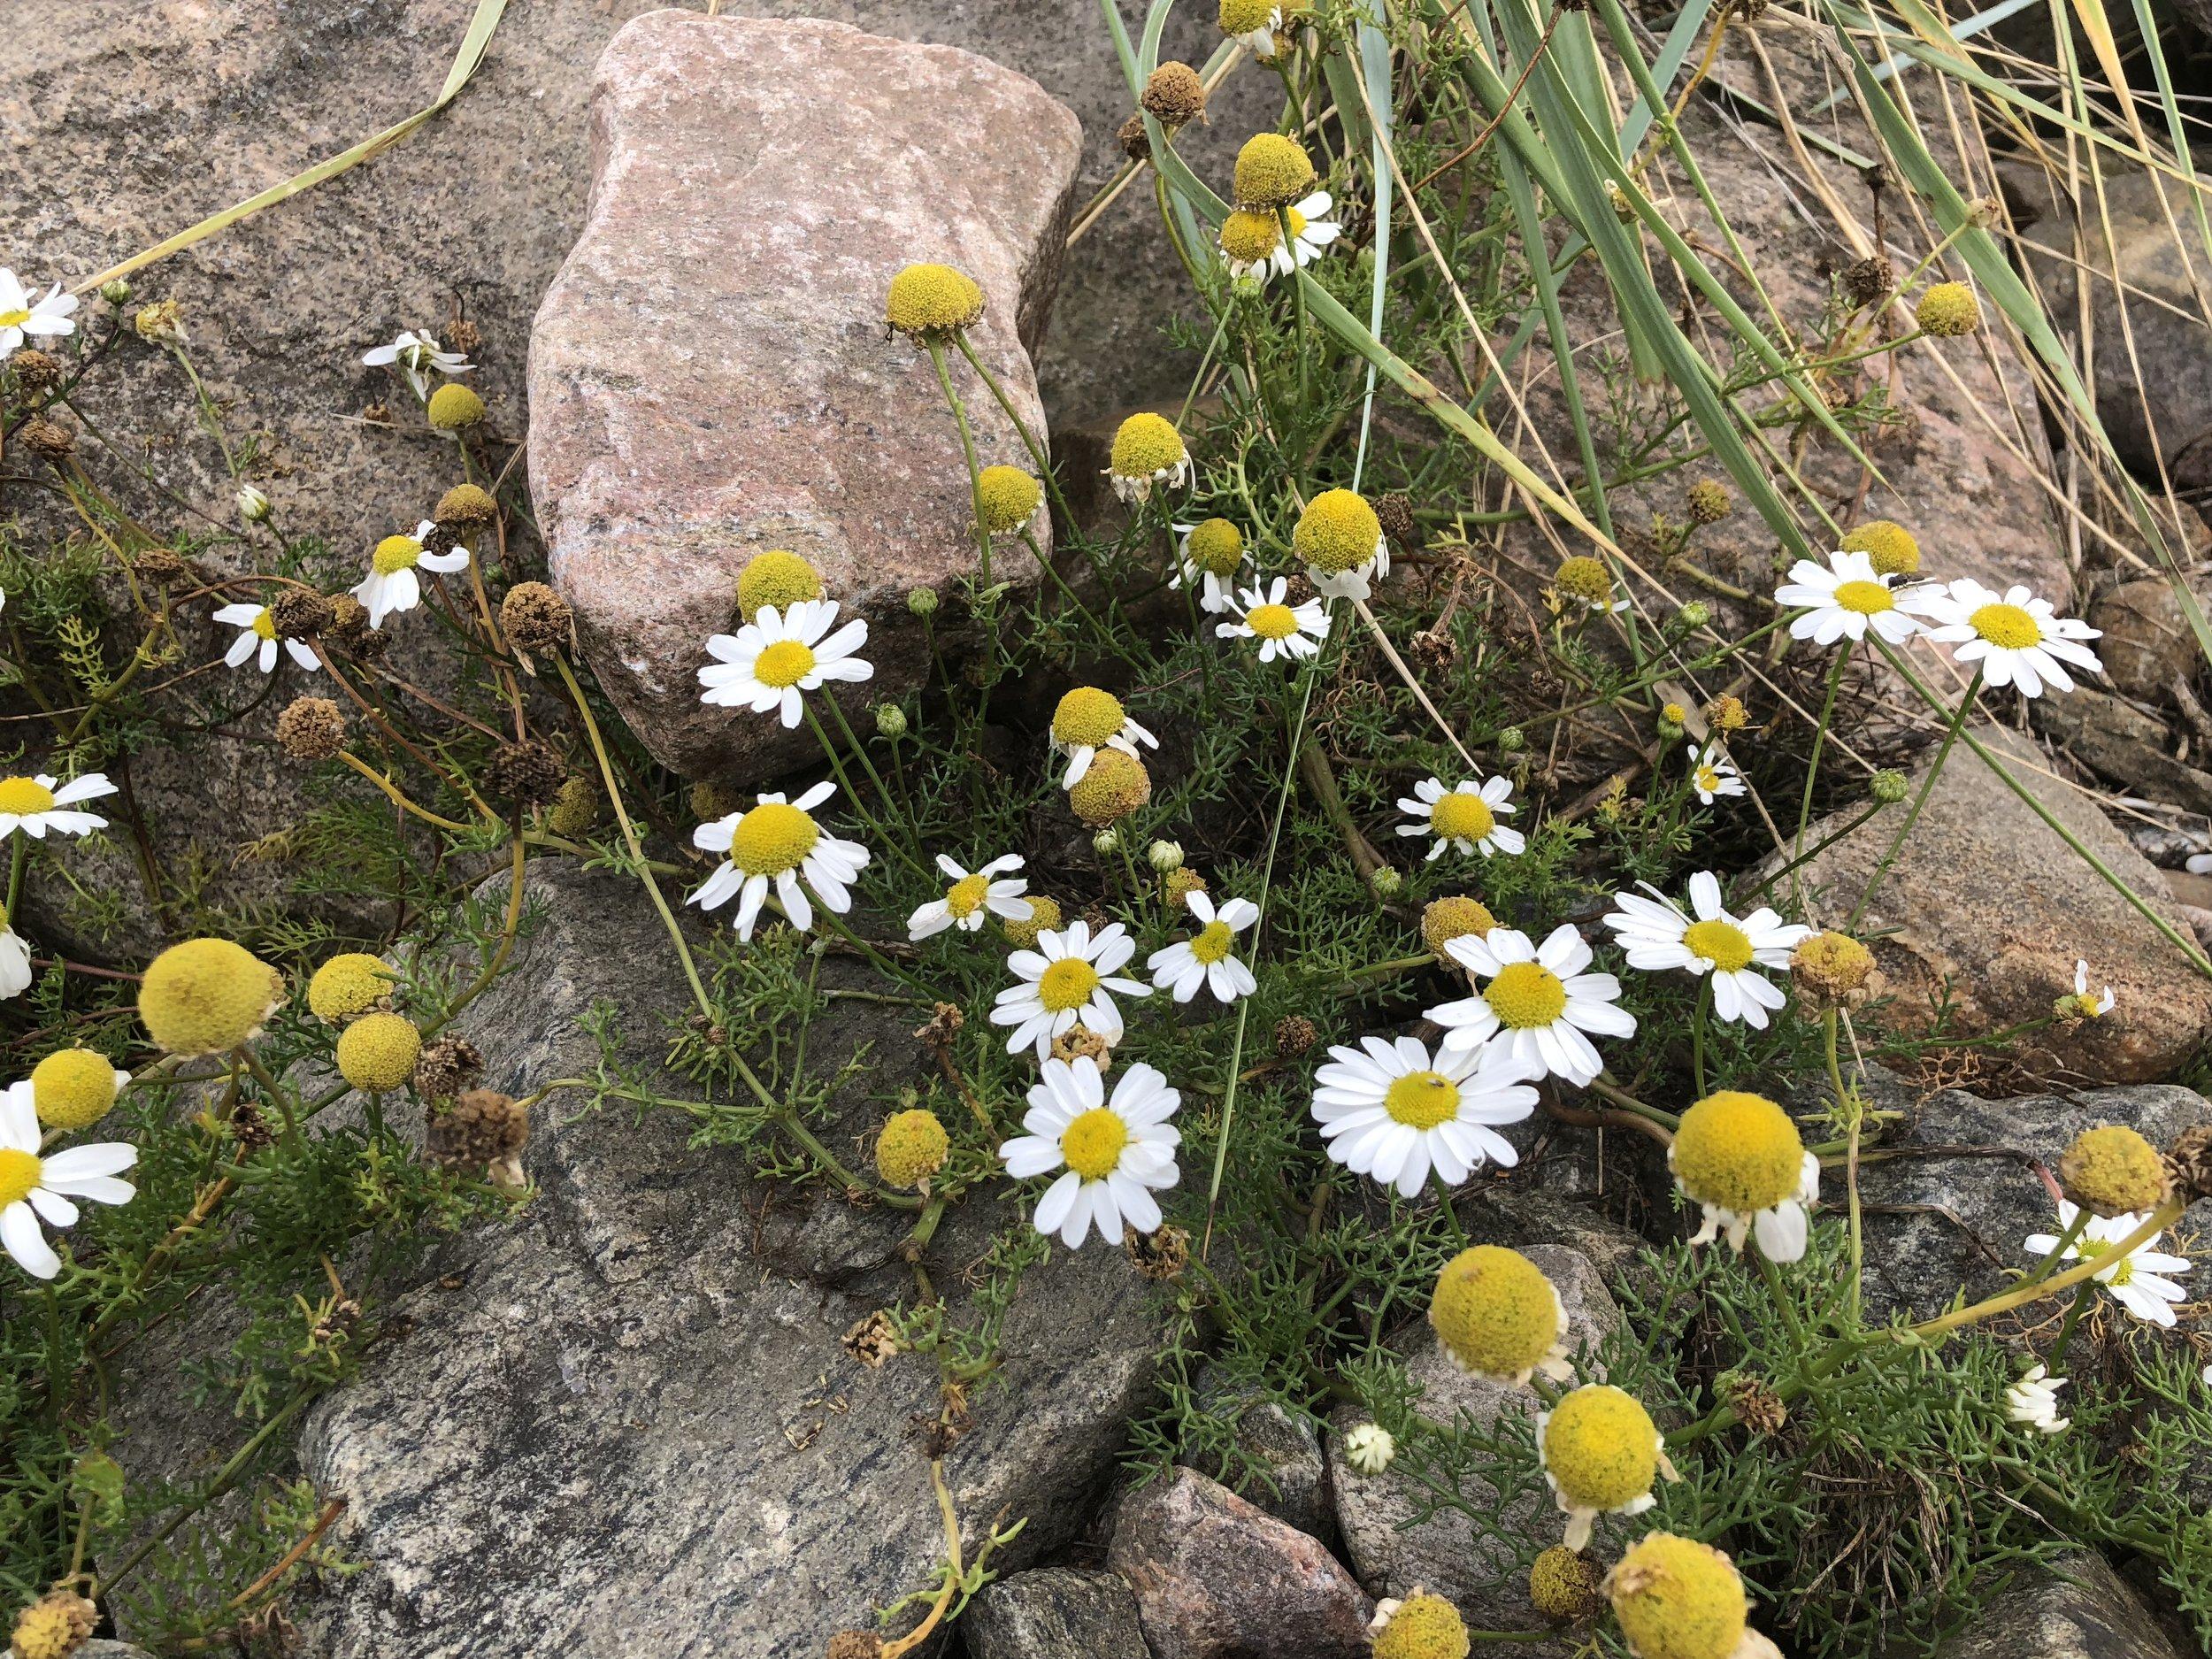 Swedish wildflowers